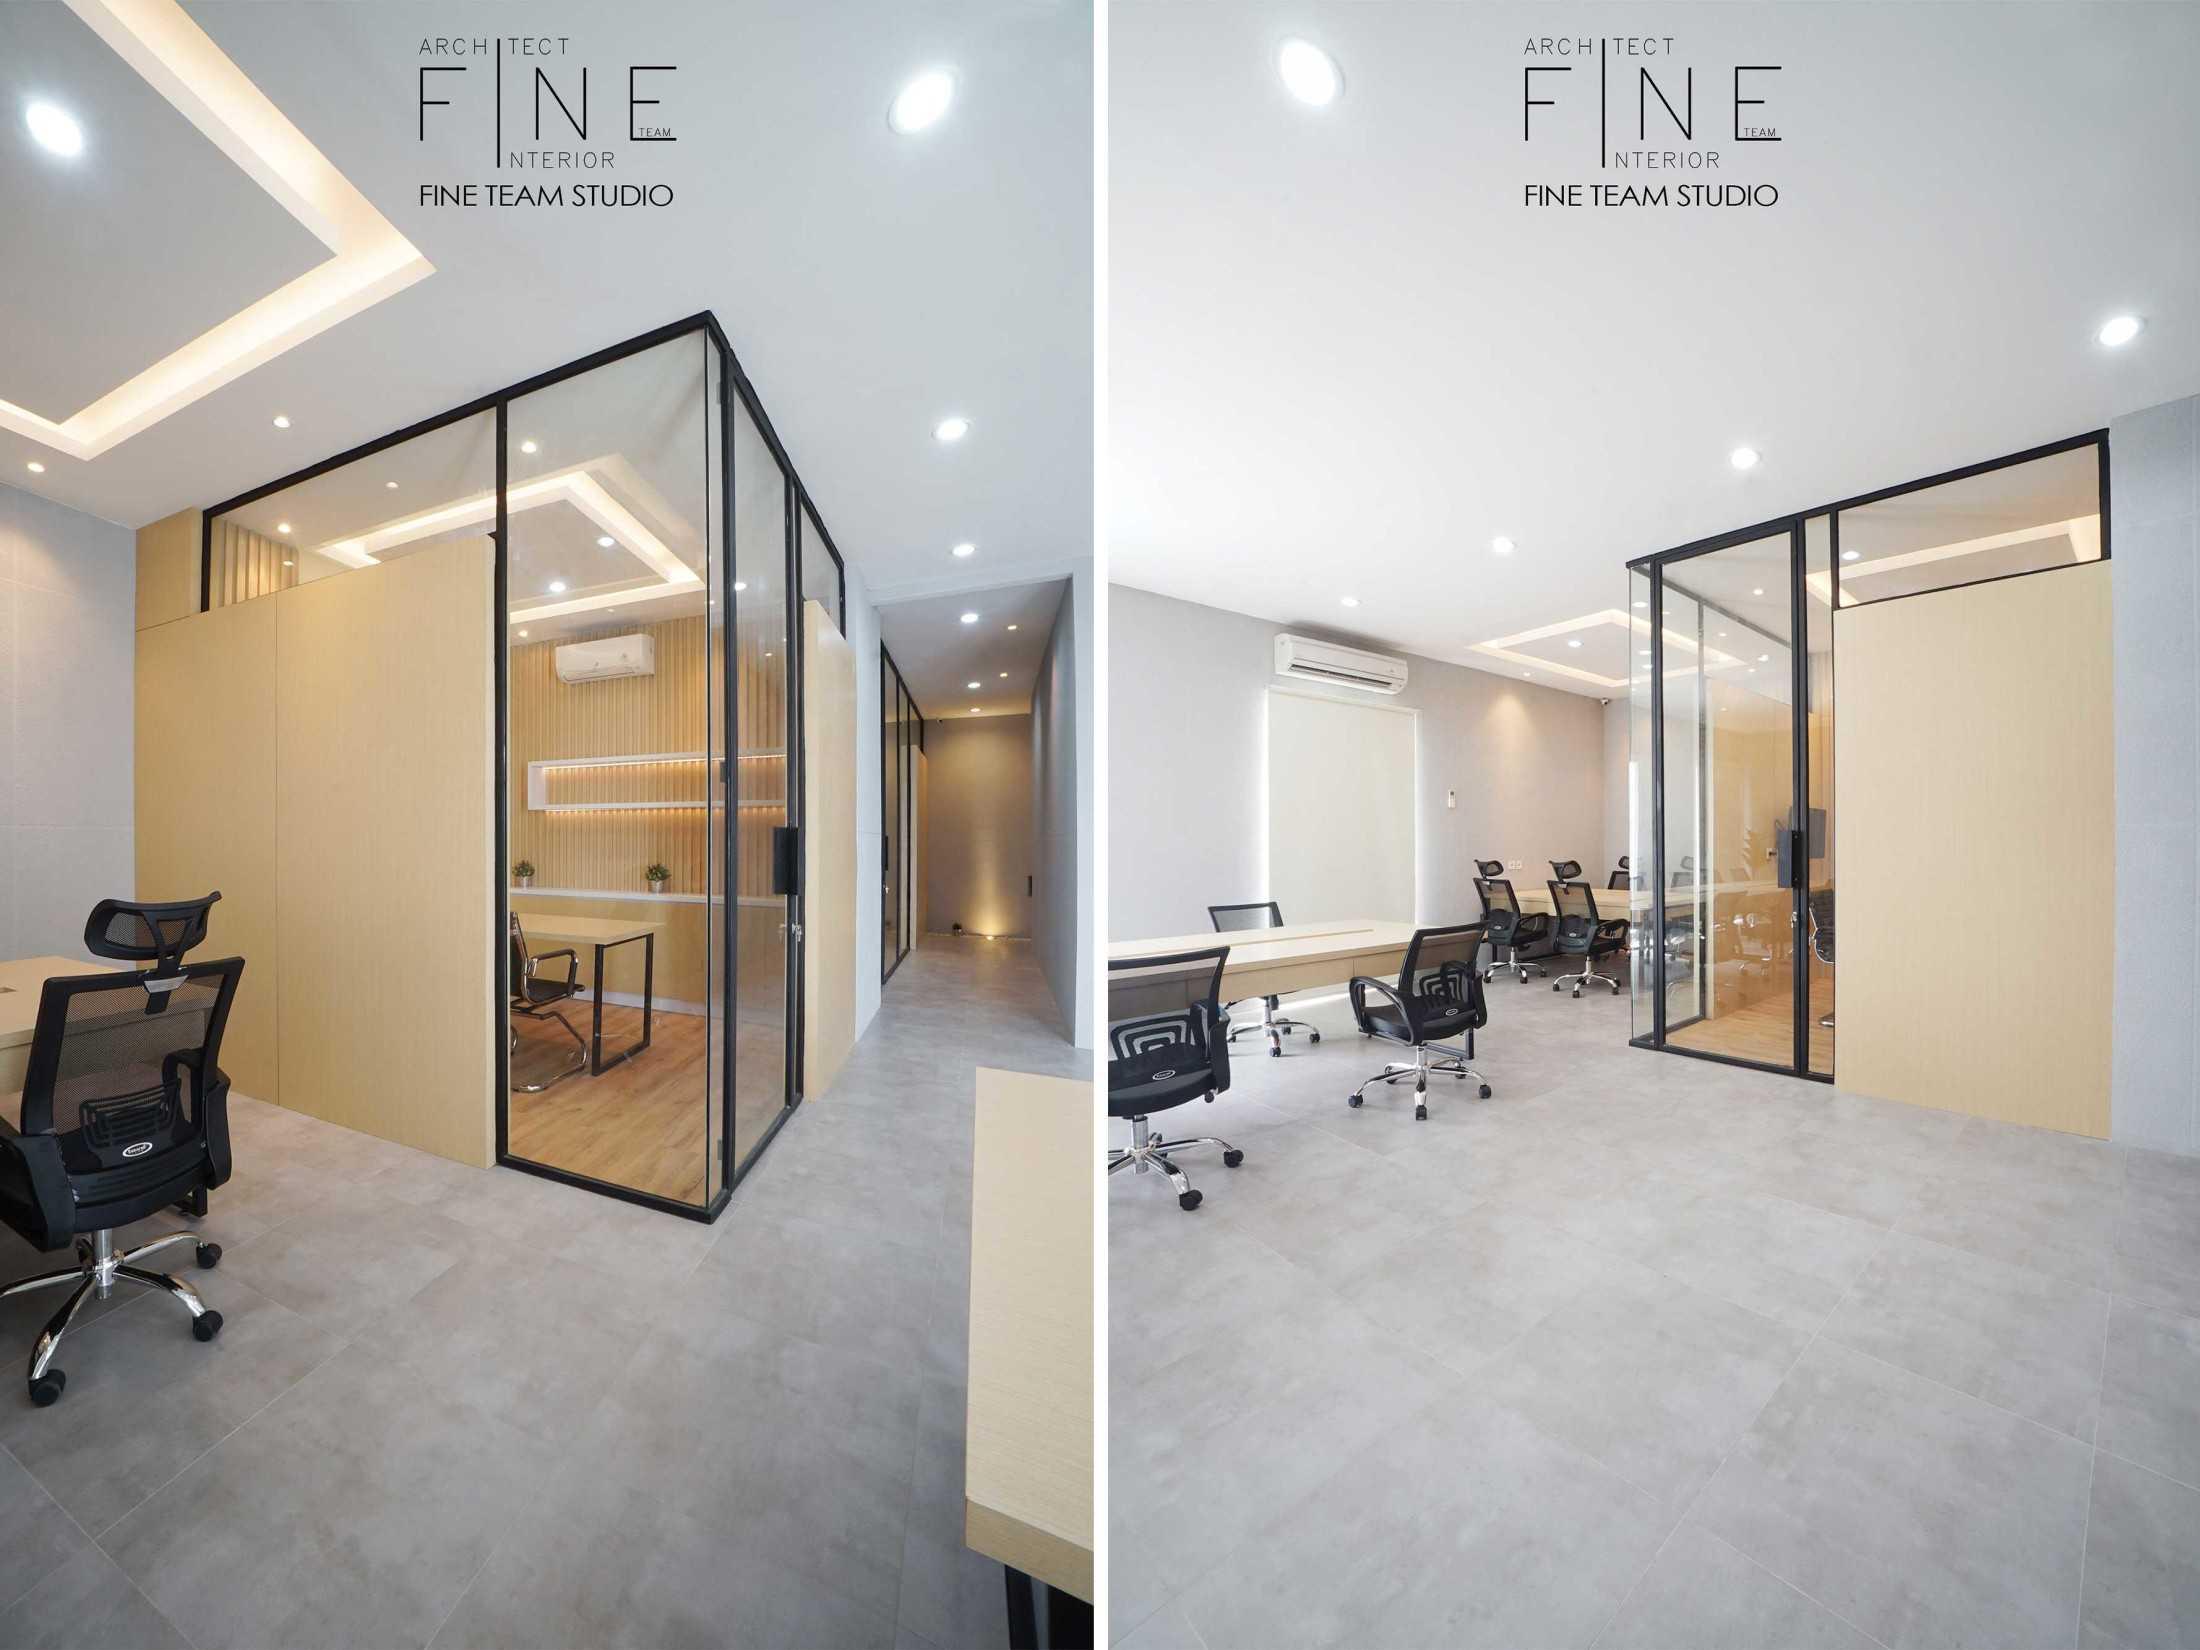 Fine Team Studio Mob Office Cikupa, Tangerang, Banten, Indonesia Cikupa, Tangerang, Banten, Indonesia Fine-Team-Studio-Mob-Office  71129